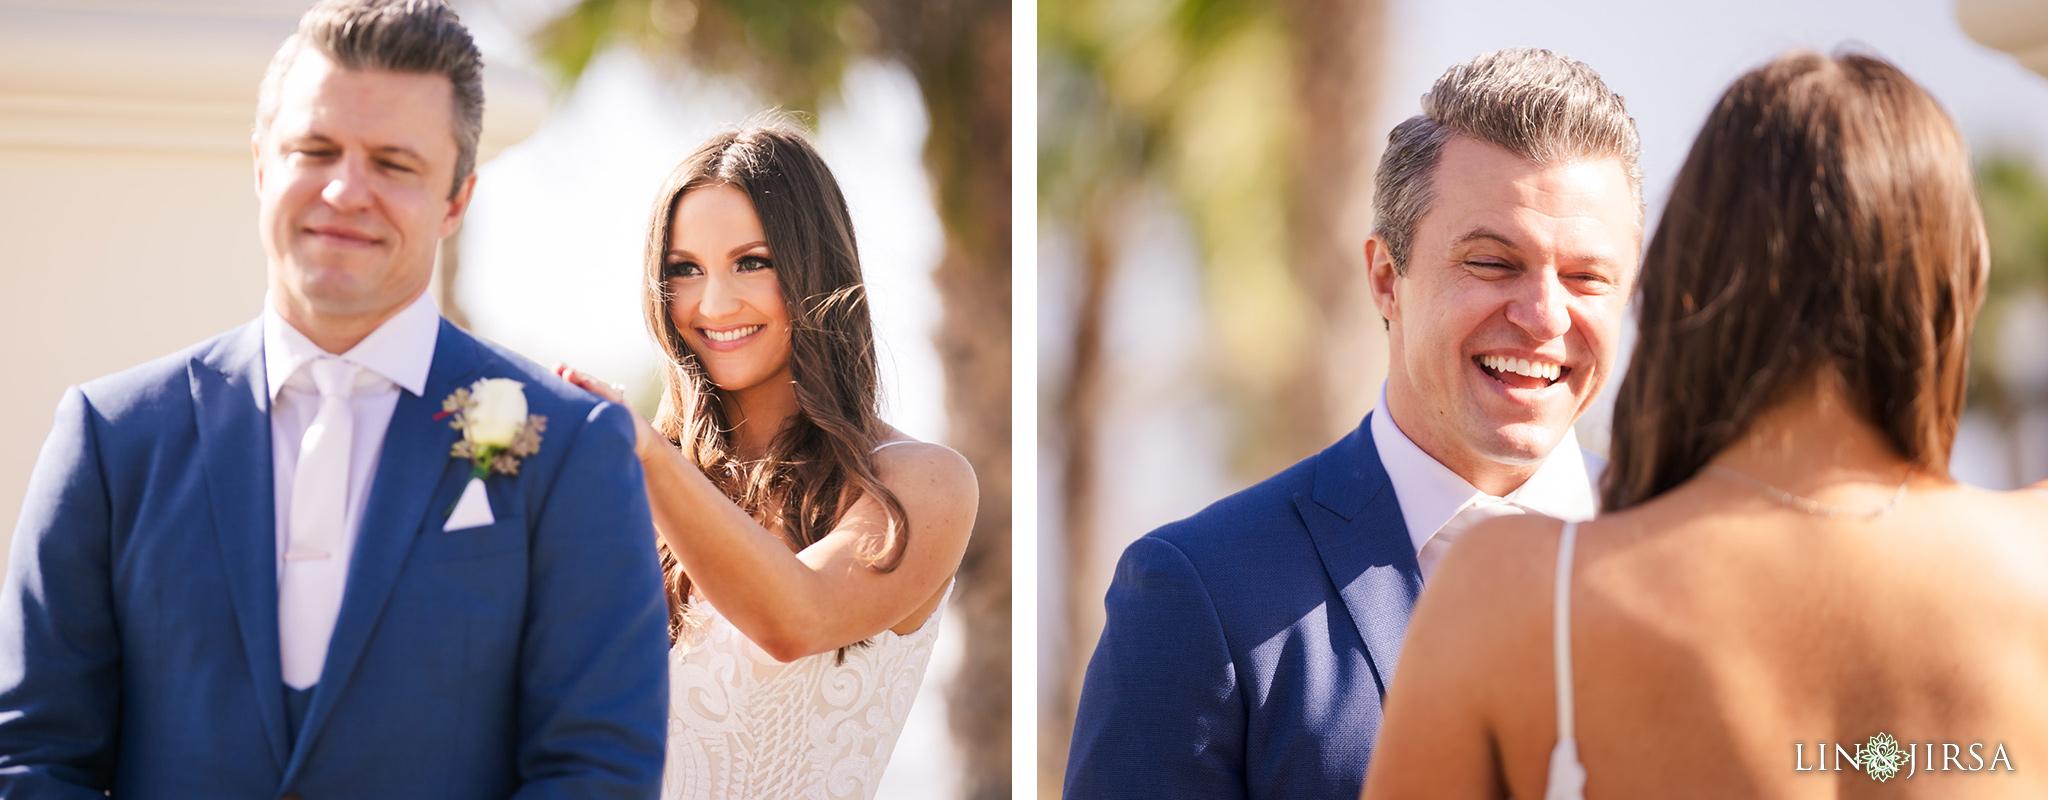 05 Hyatt Regency Huntington Beach Wedding Photography